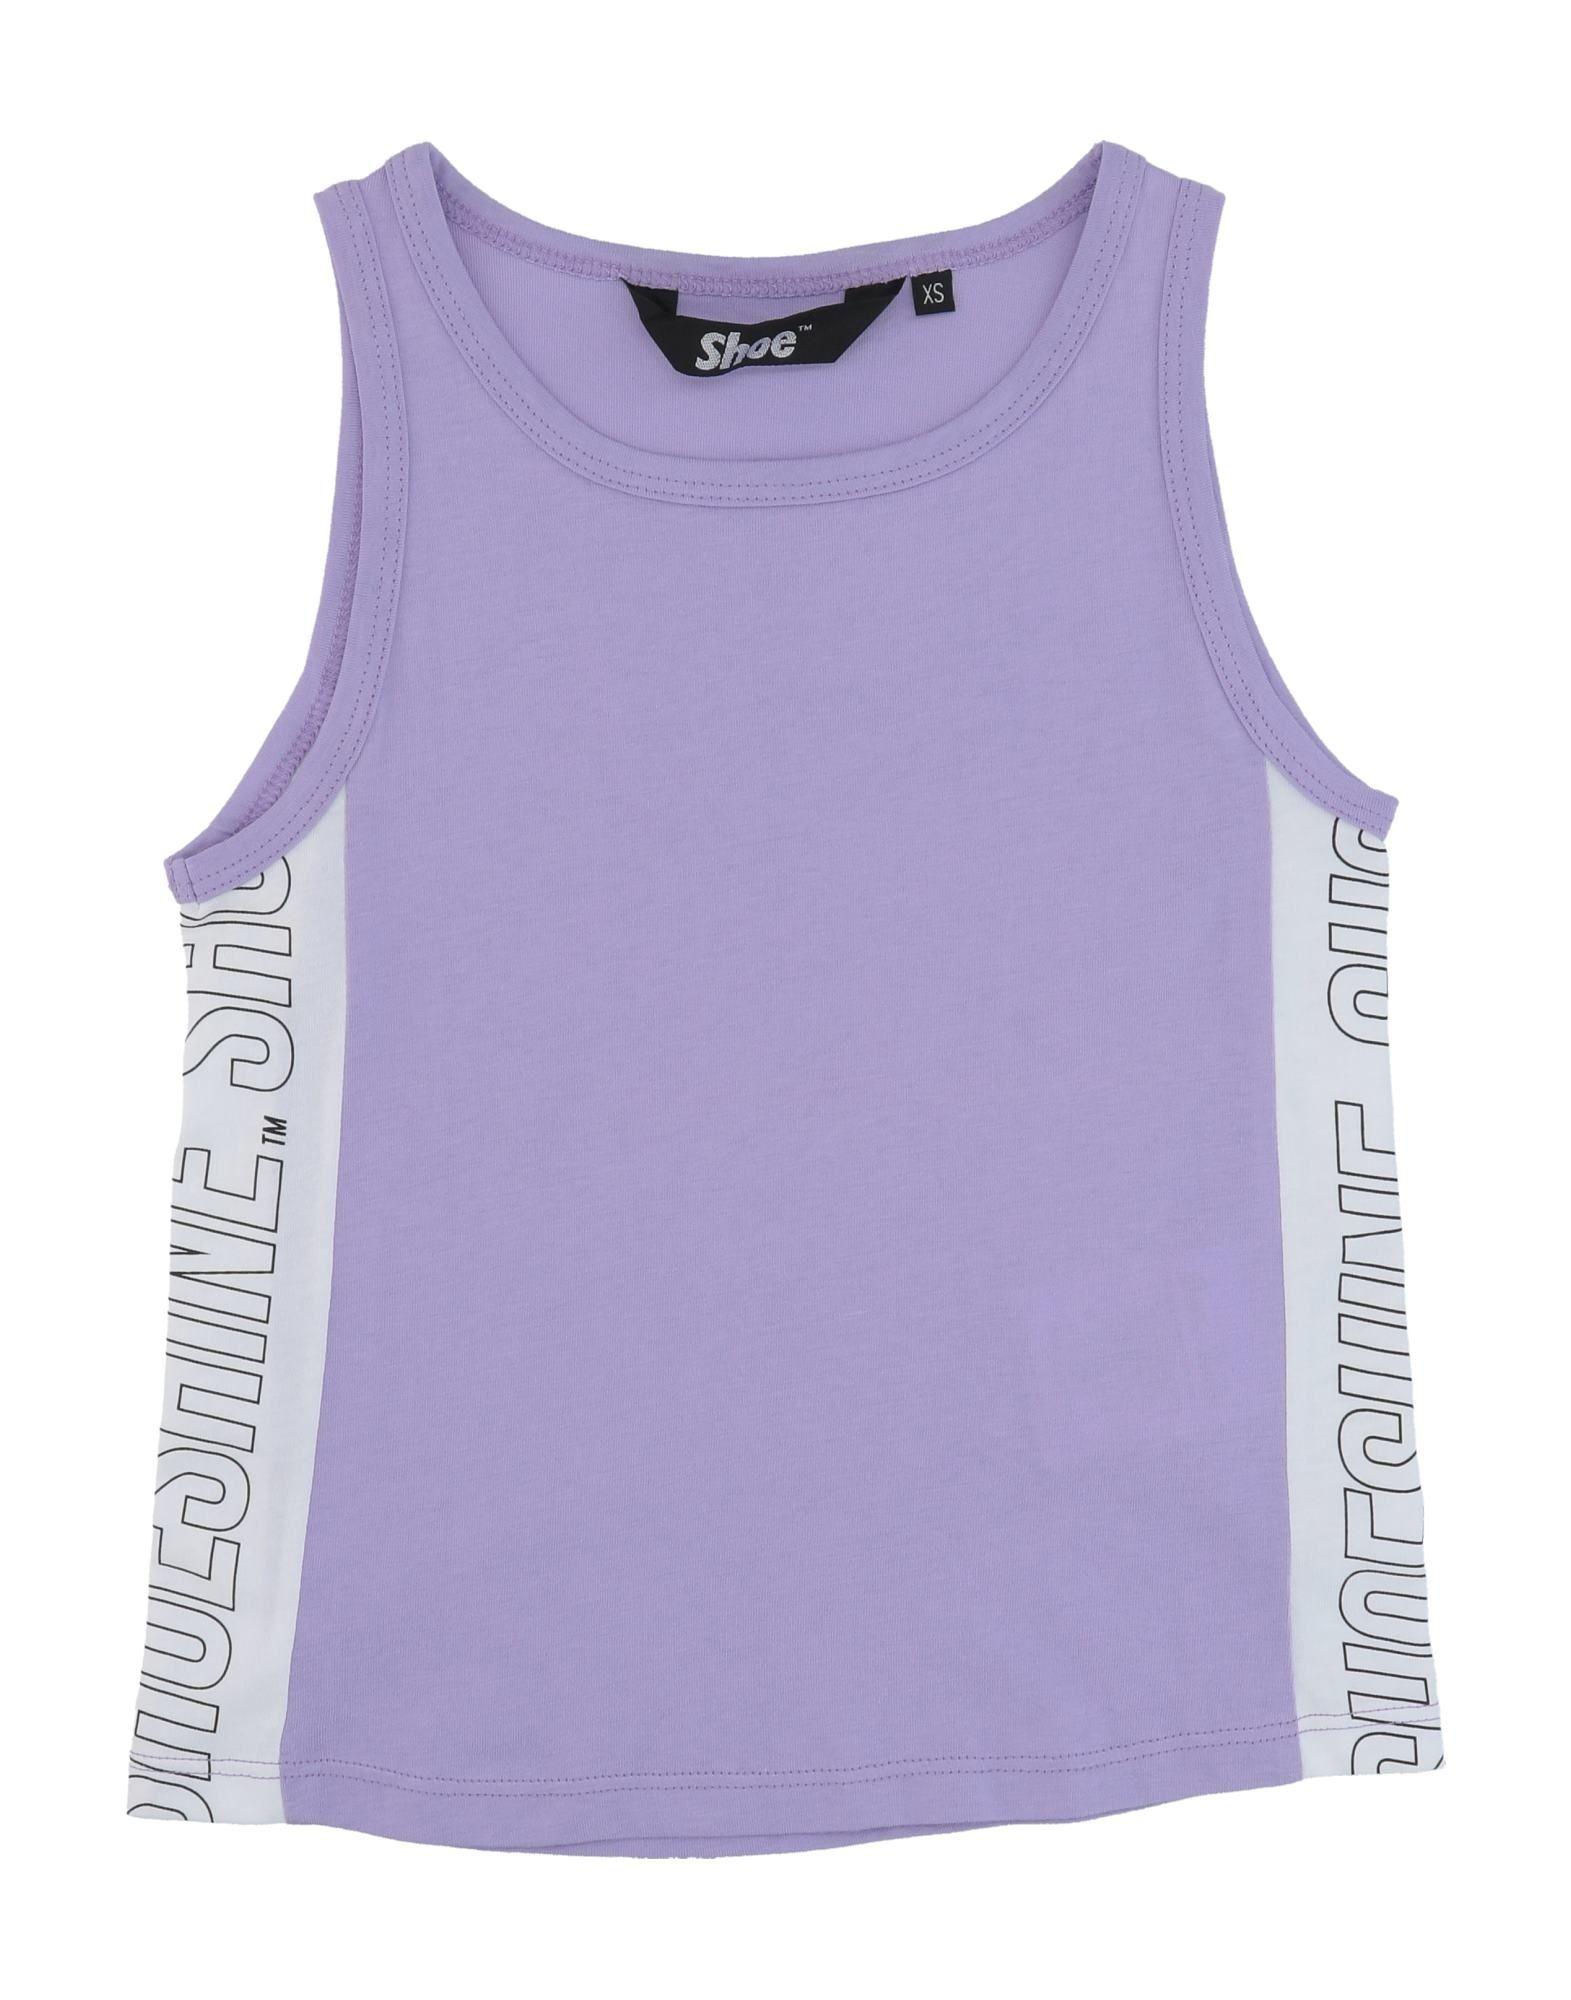 Shoeshine Kids' T-shirts In Purple